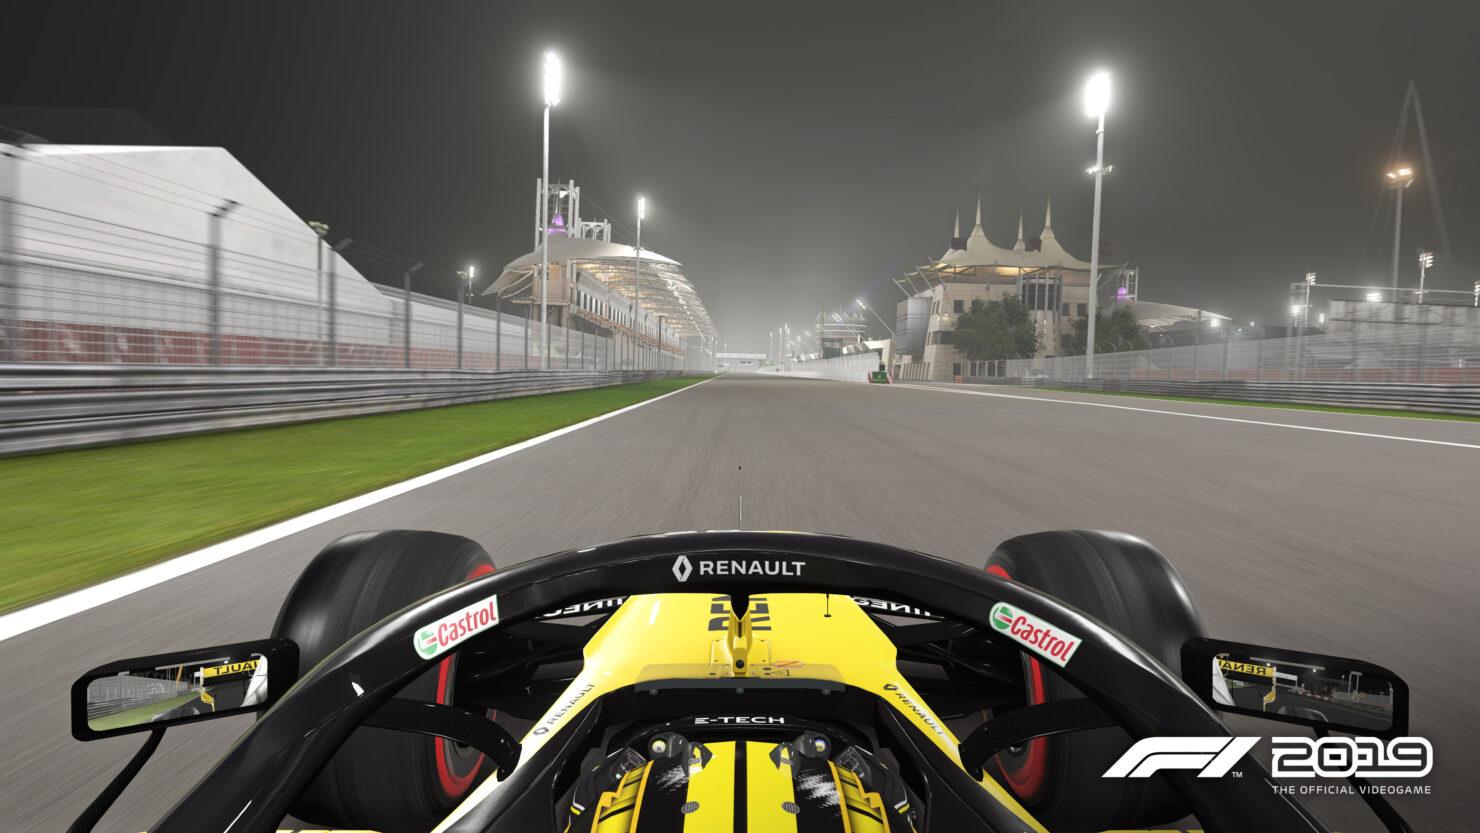 f1-2019-night-lighting-comparison-02-part-2-bahrain-2019-01